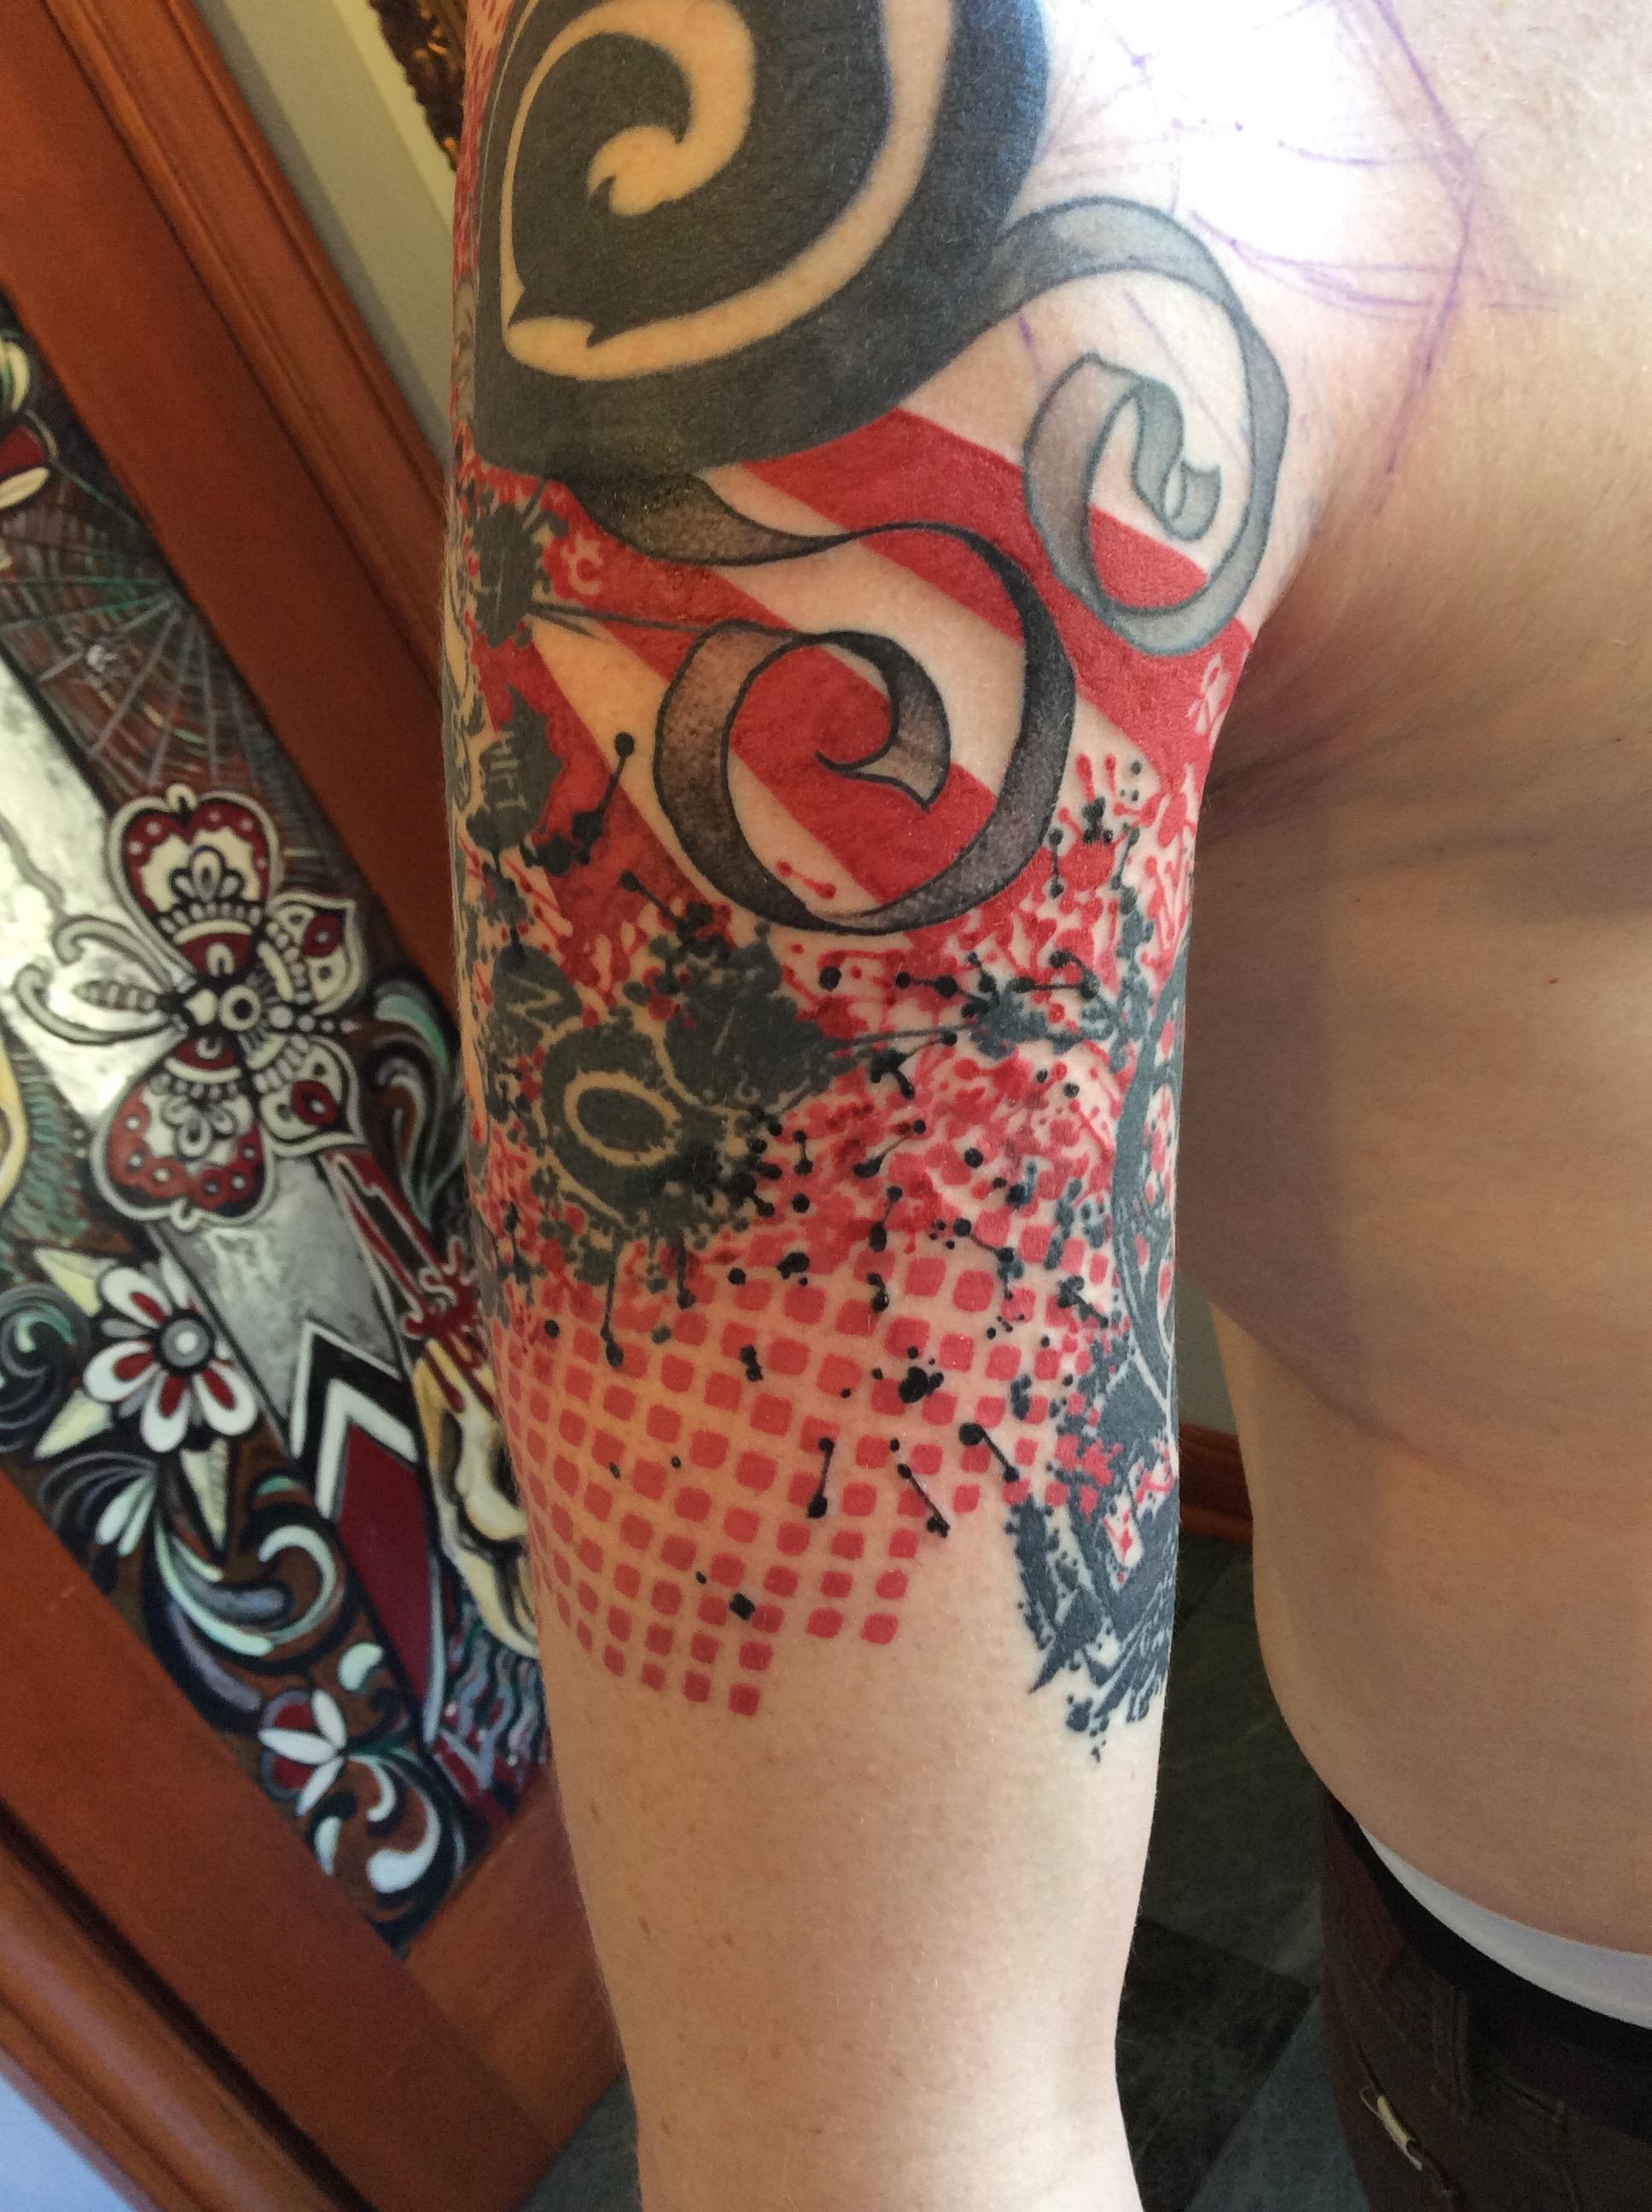 Trash_polka_tattoo_front.jpg